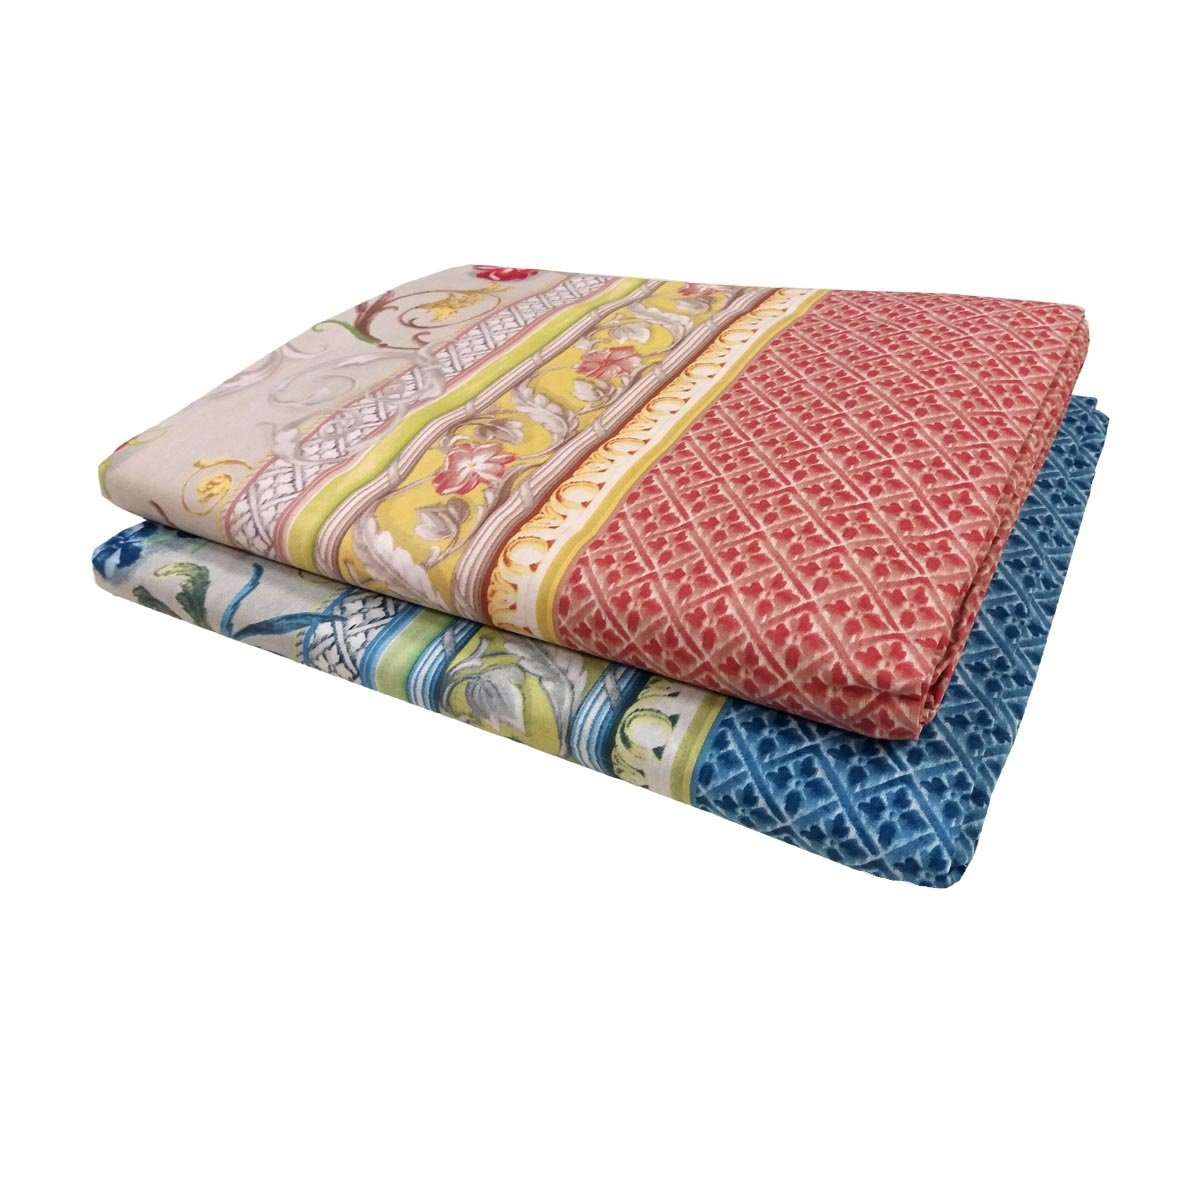 Vendite di teli arredo grand foulards bassetti belli for Bassetti telo arredo